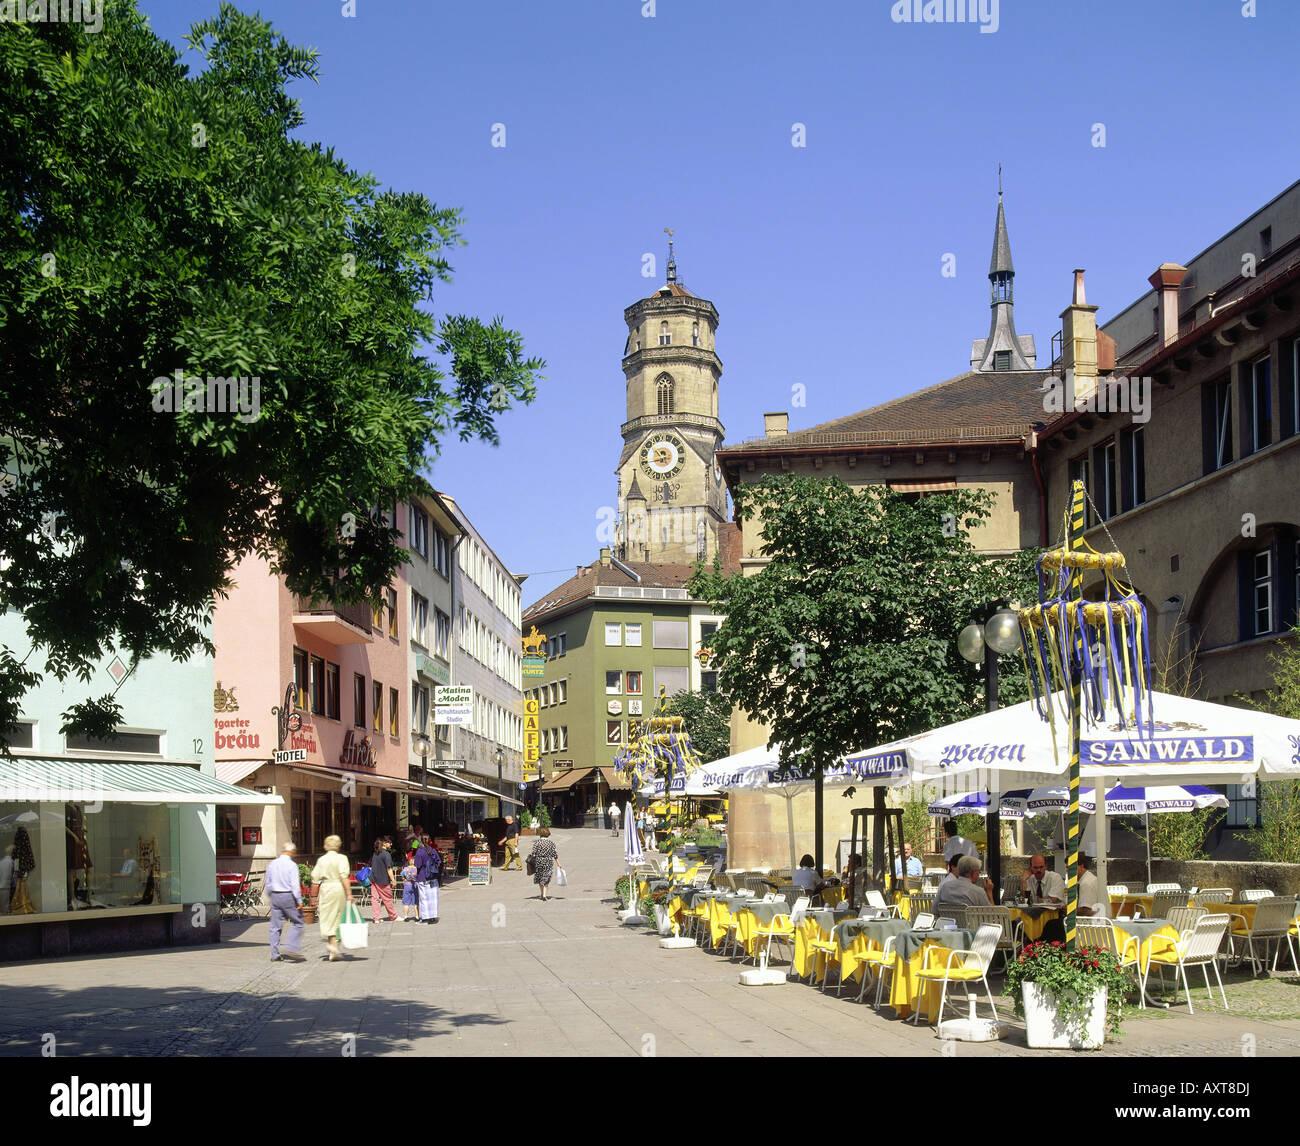 geography / travel, Germany, Baden-Wuerttemberg, Stuttgart, street scenes, pedestrian precinct / pedestrian area - Stock Image